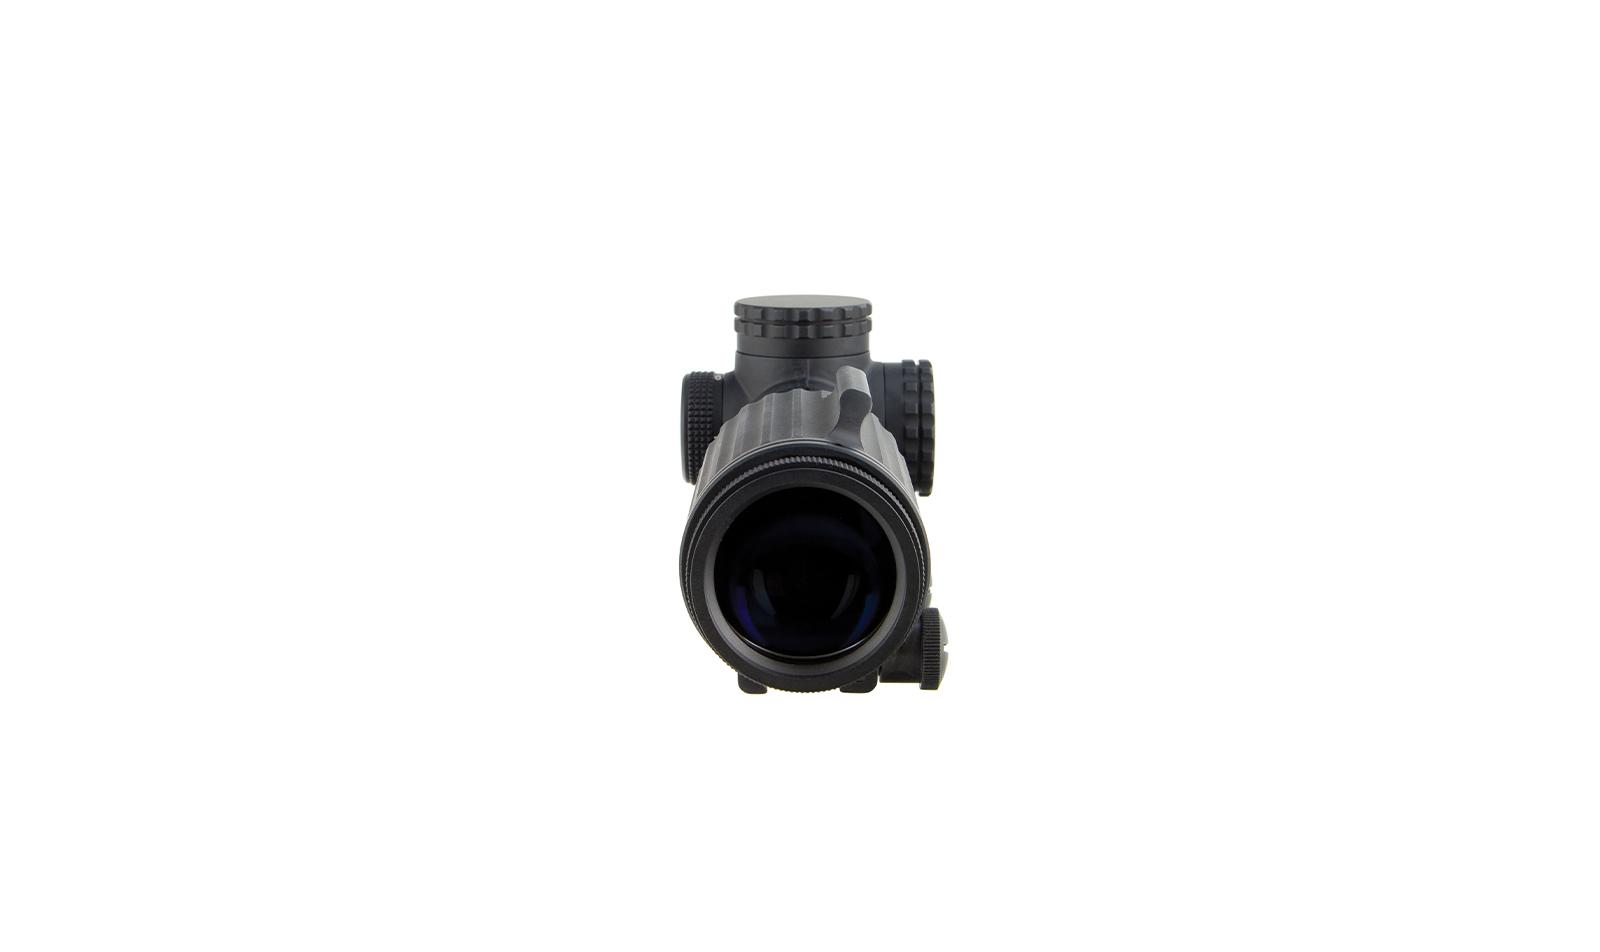 VC16-C-1600004 angle 4